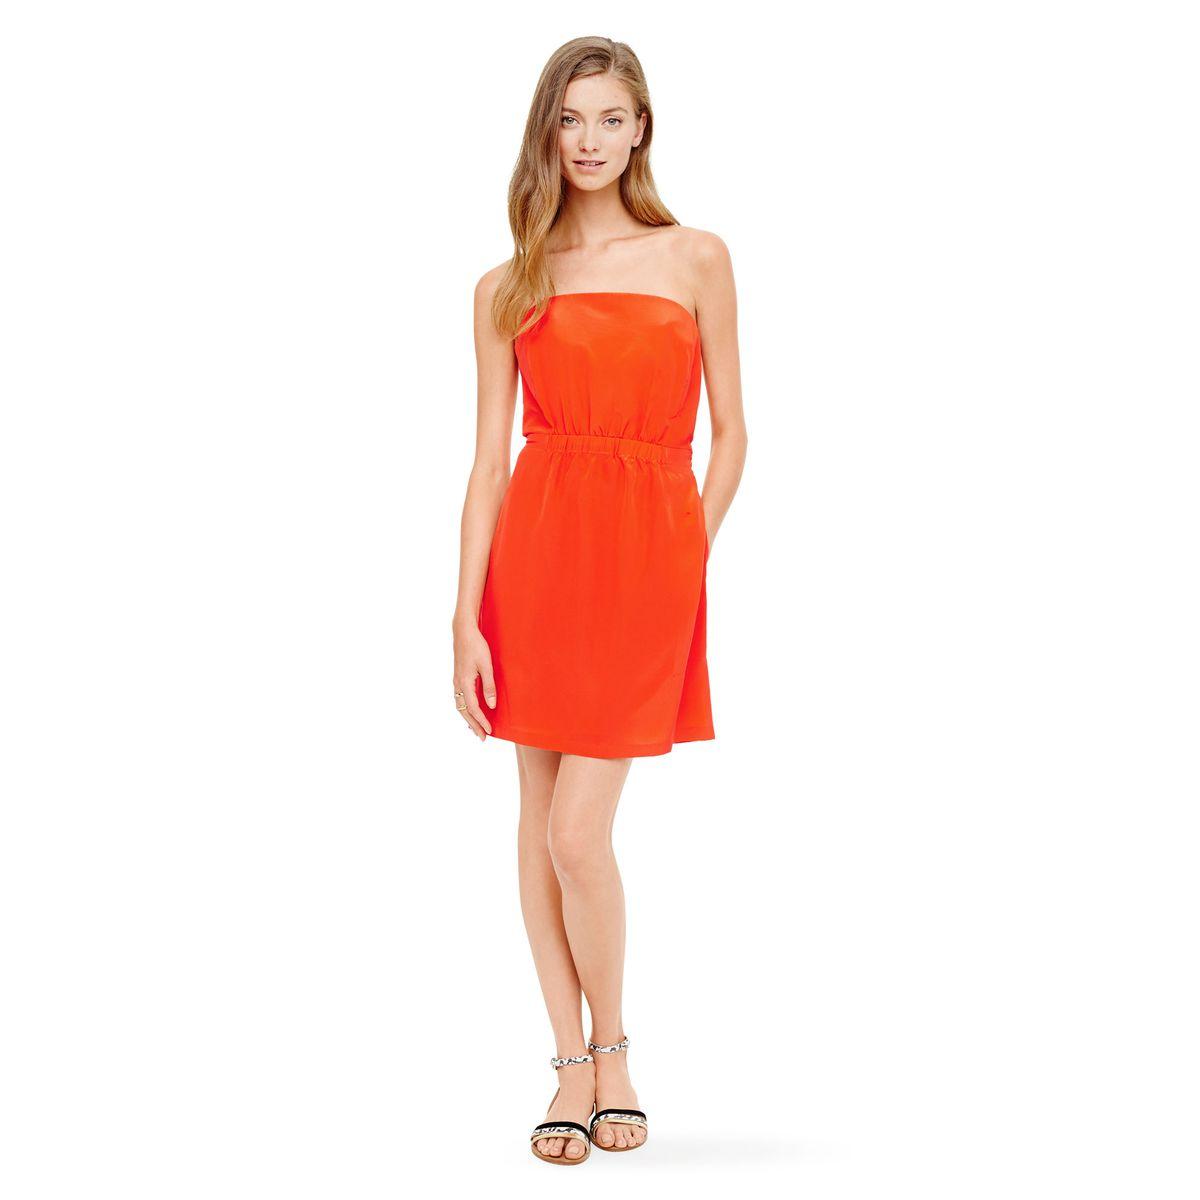 Club Monaco Adeline Strapless Dress, $159